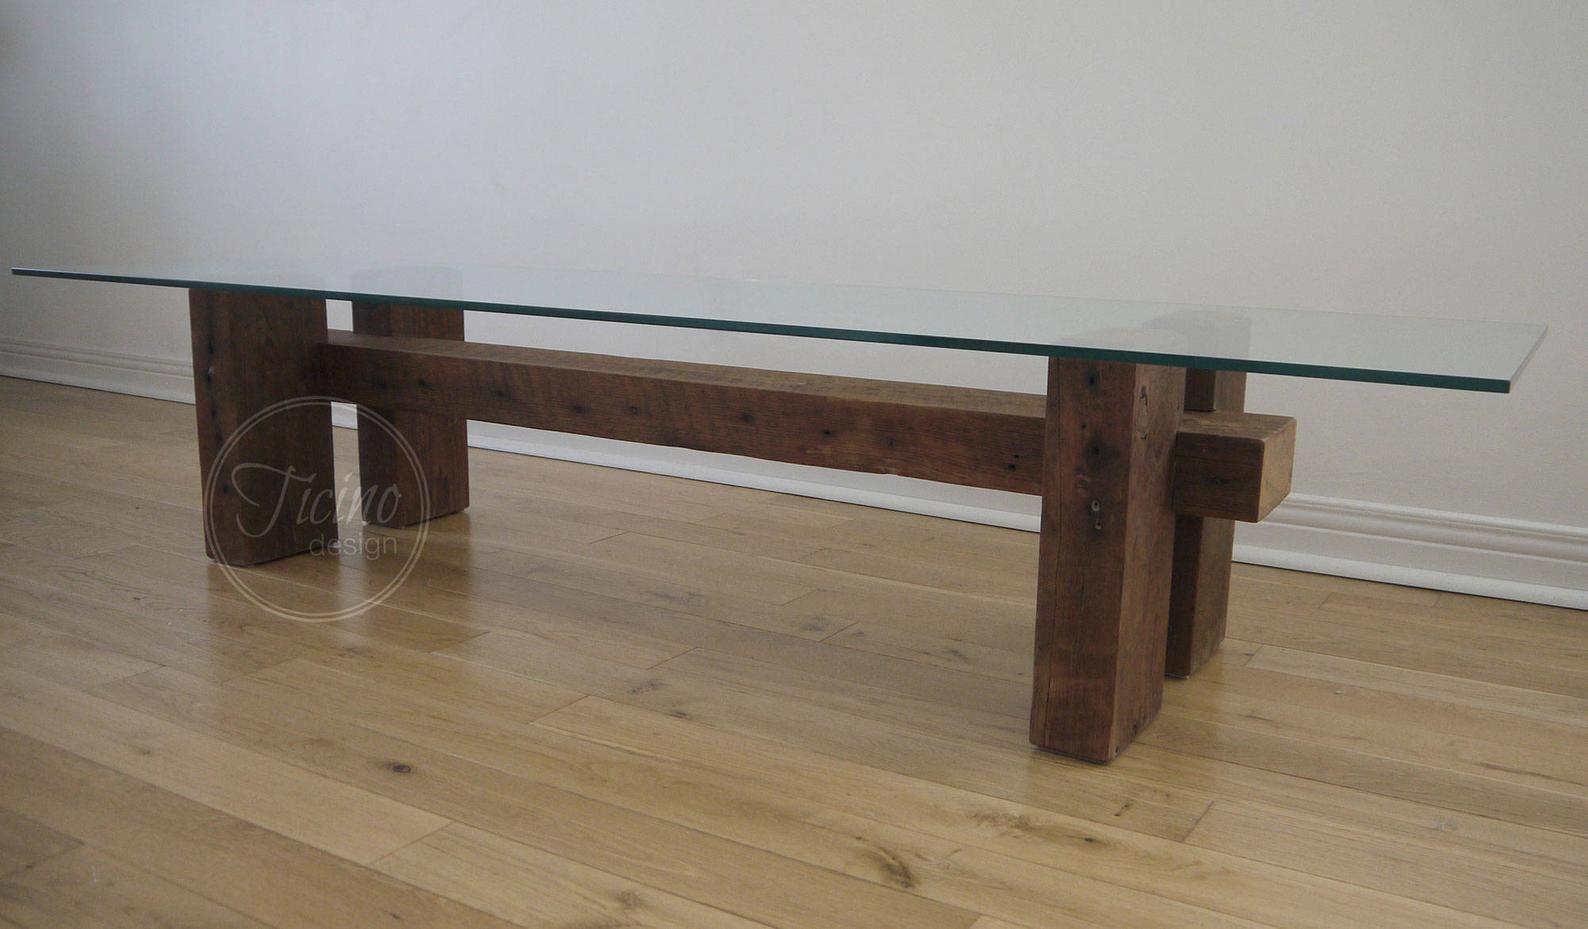 Reclaimed Wood Coffee Table Glass Coffee Table Rustic Coffee Etsy Reclaimed Wood Coffee Table Coffee Table Wood Rustic Coffee Tables [ 929 x 1588 Pixel ]